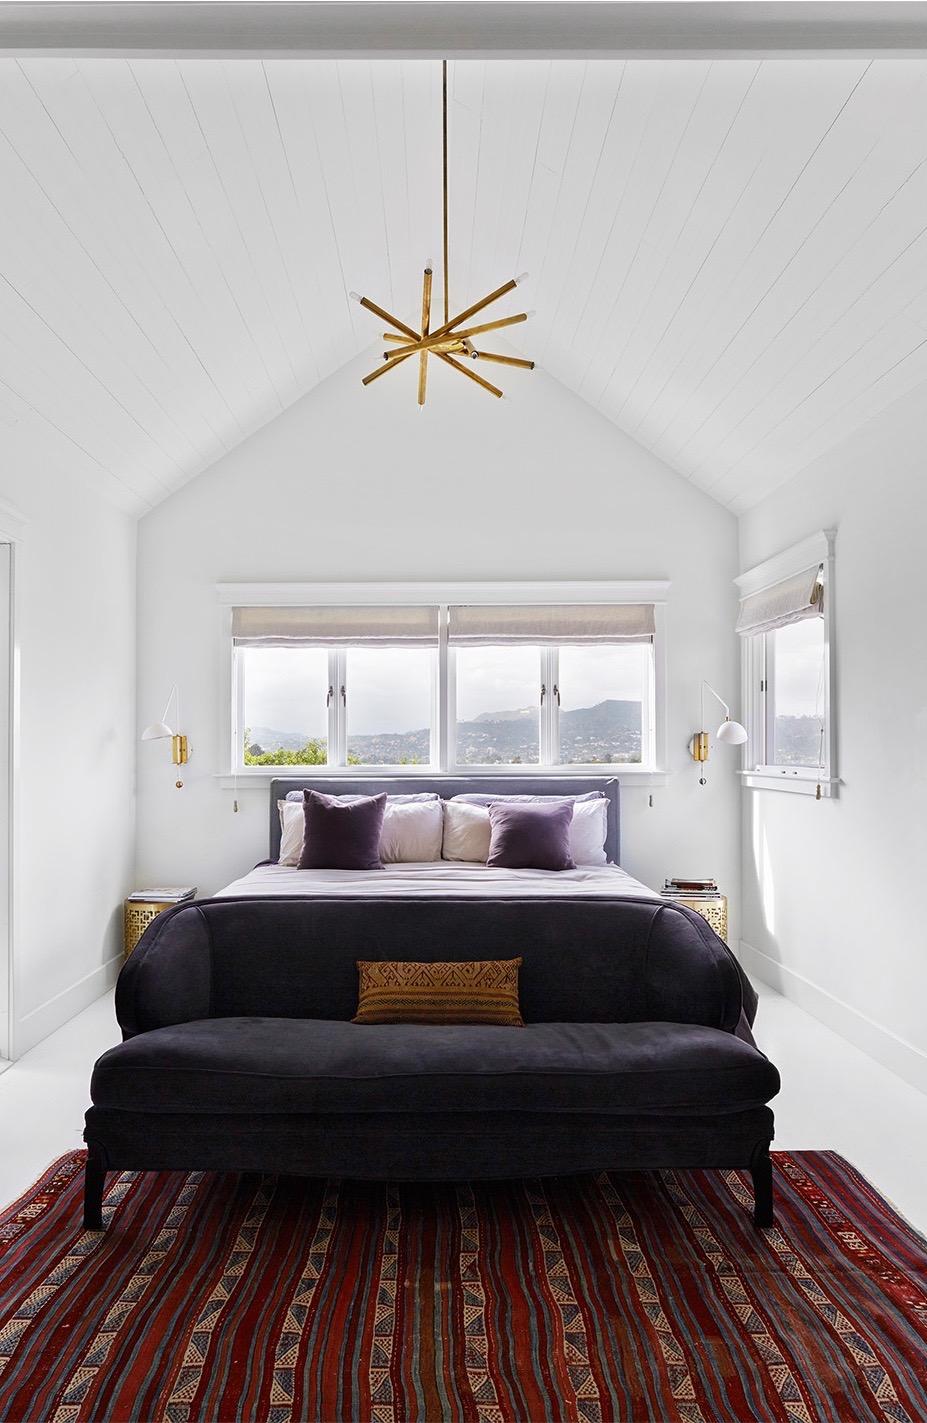 Foot Of The Bed foot of the bed — ooh la la mode